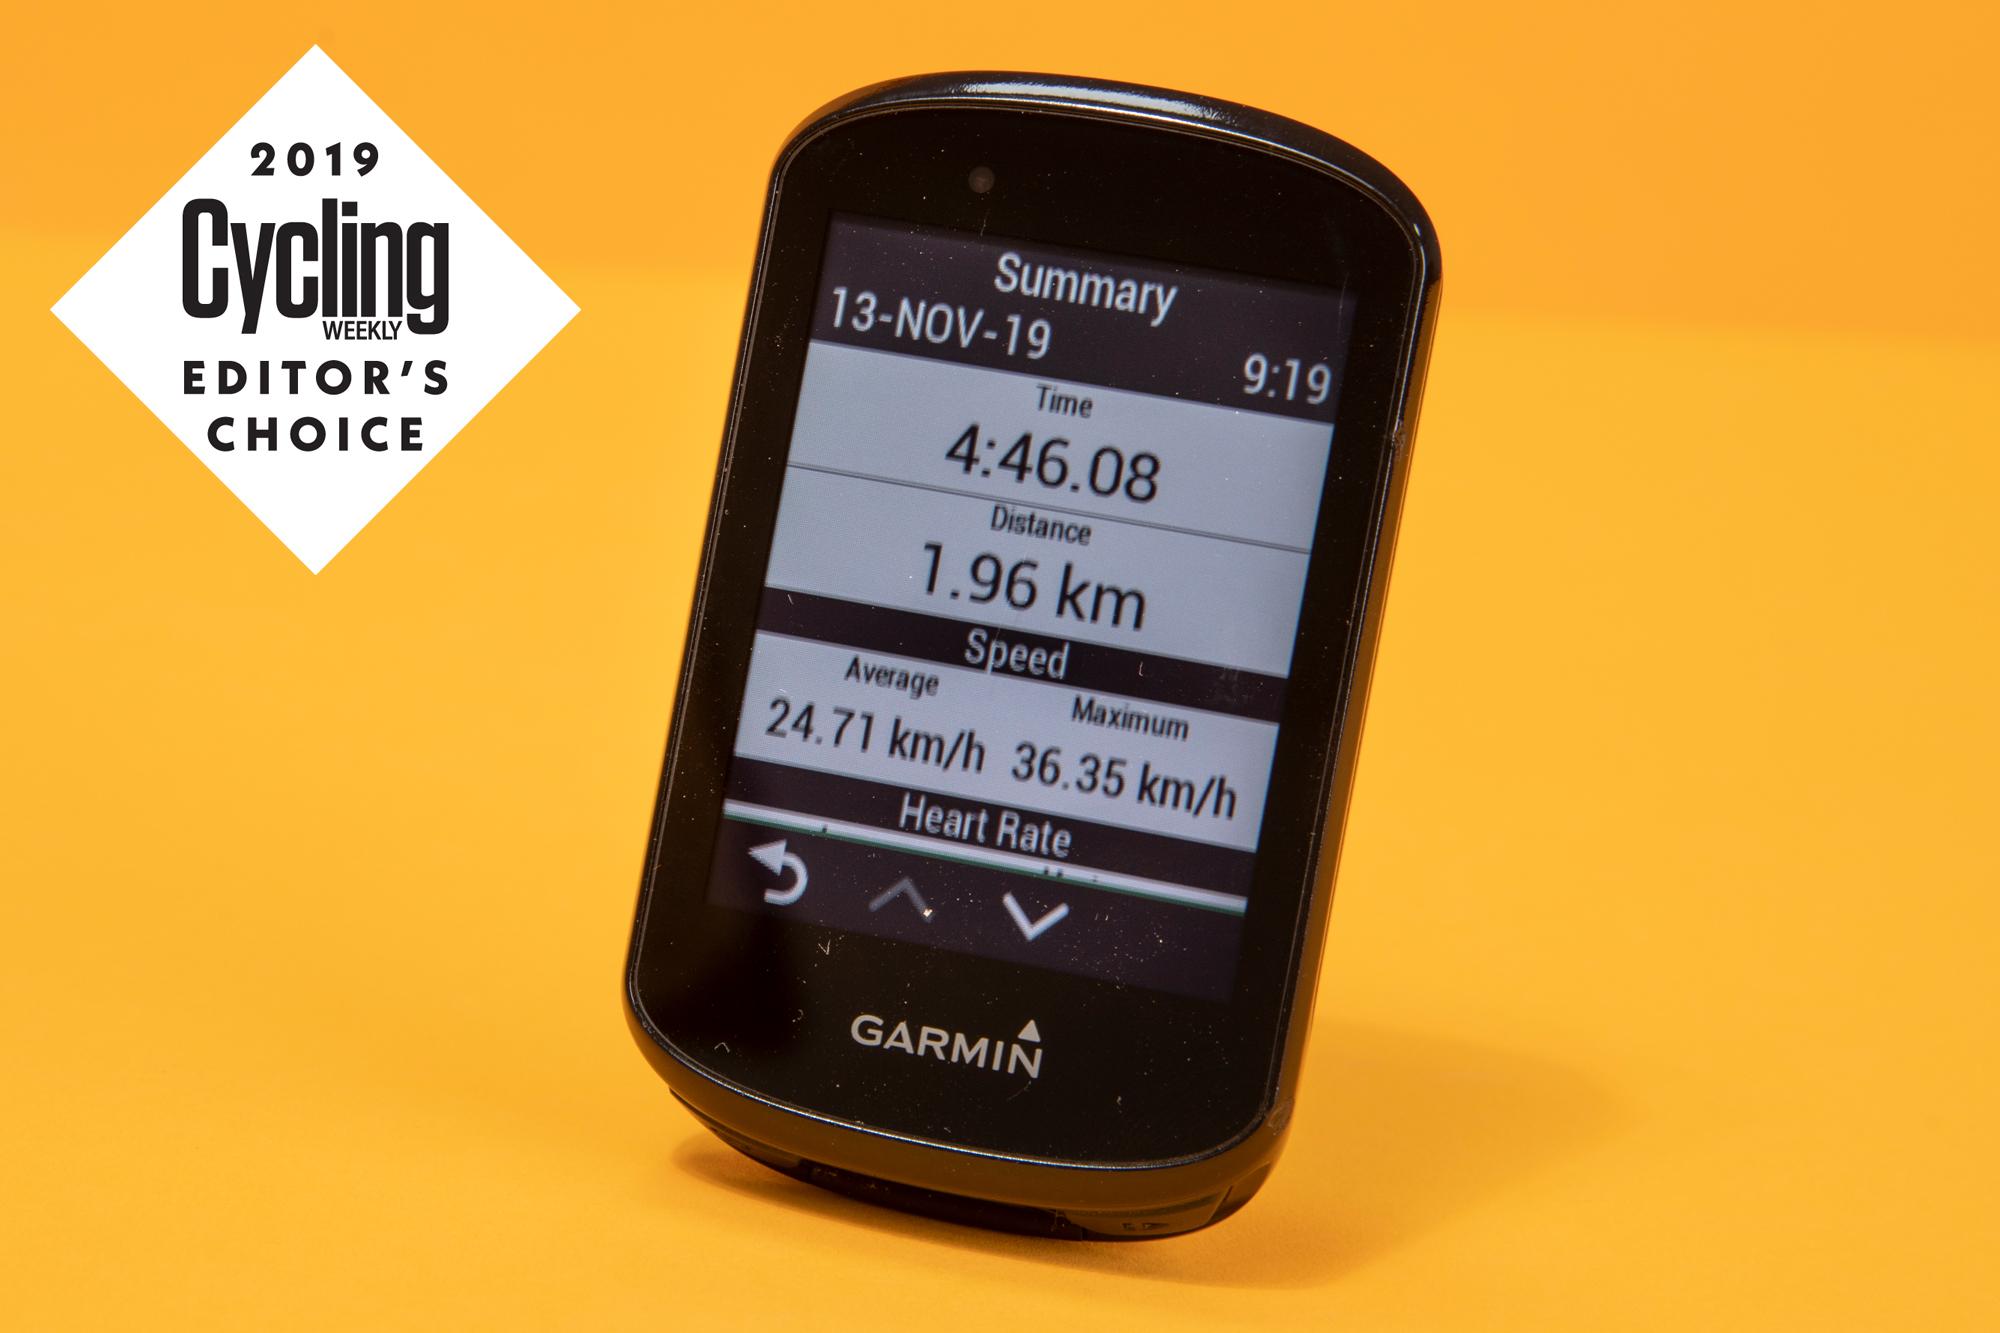 Garmin Edge 830 review - Cycling Weekly